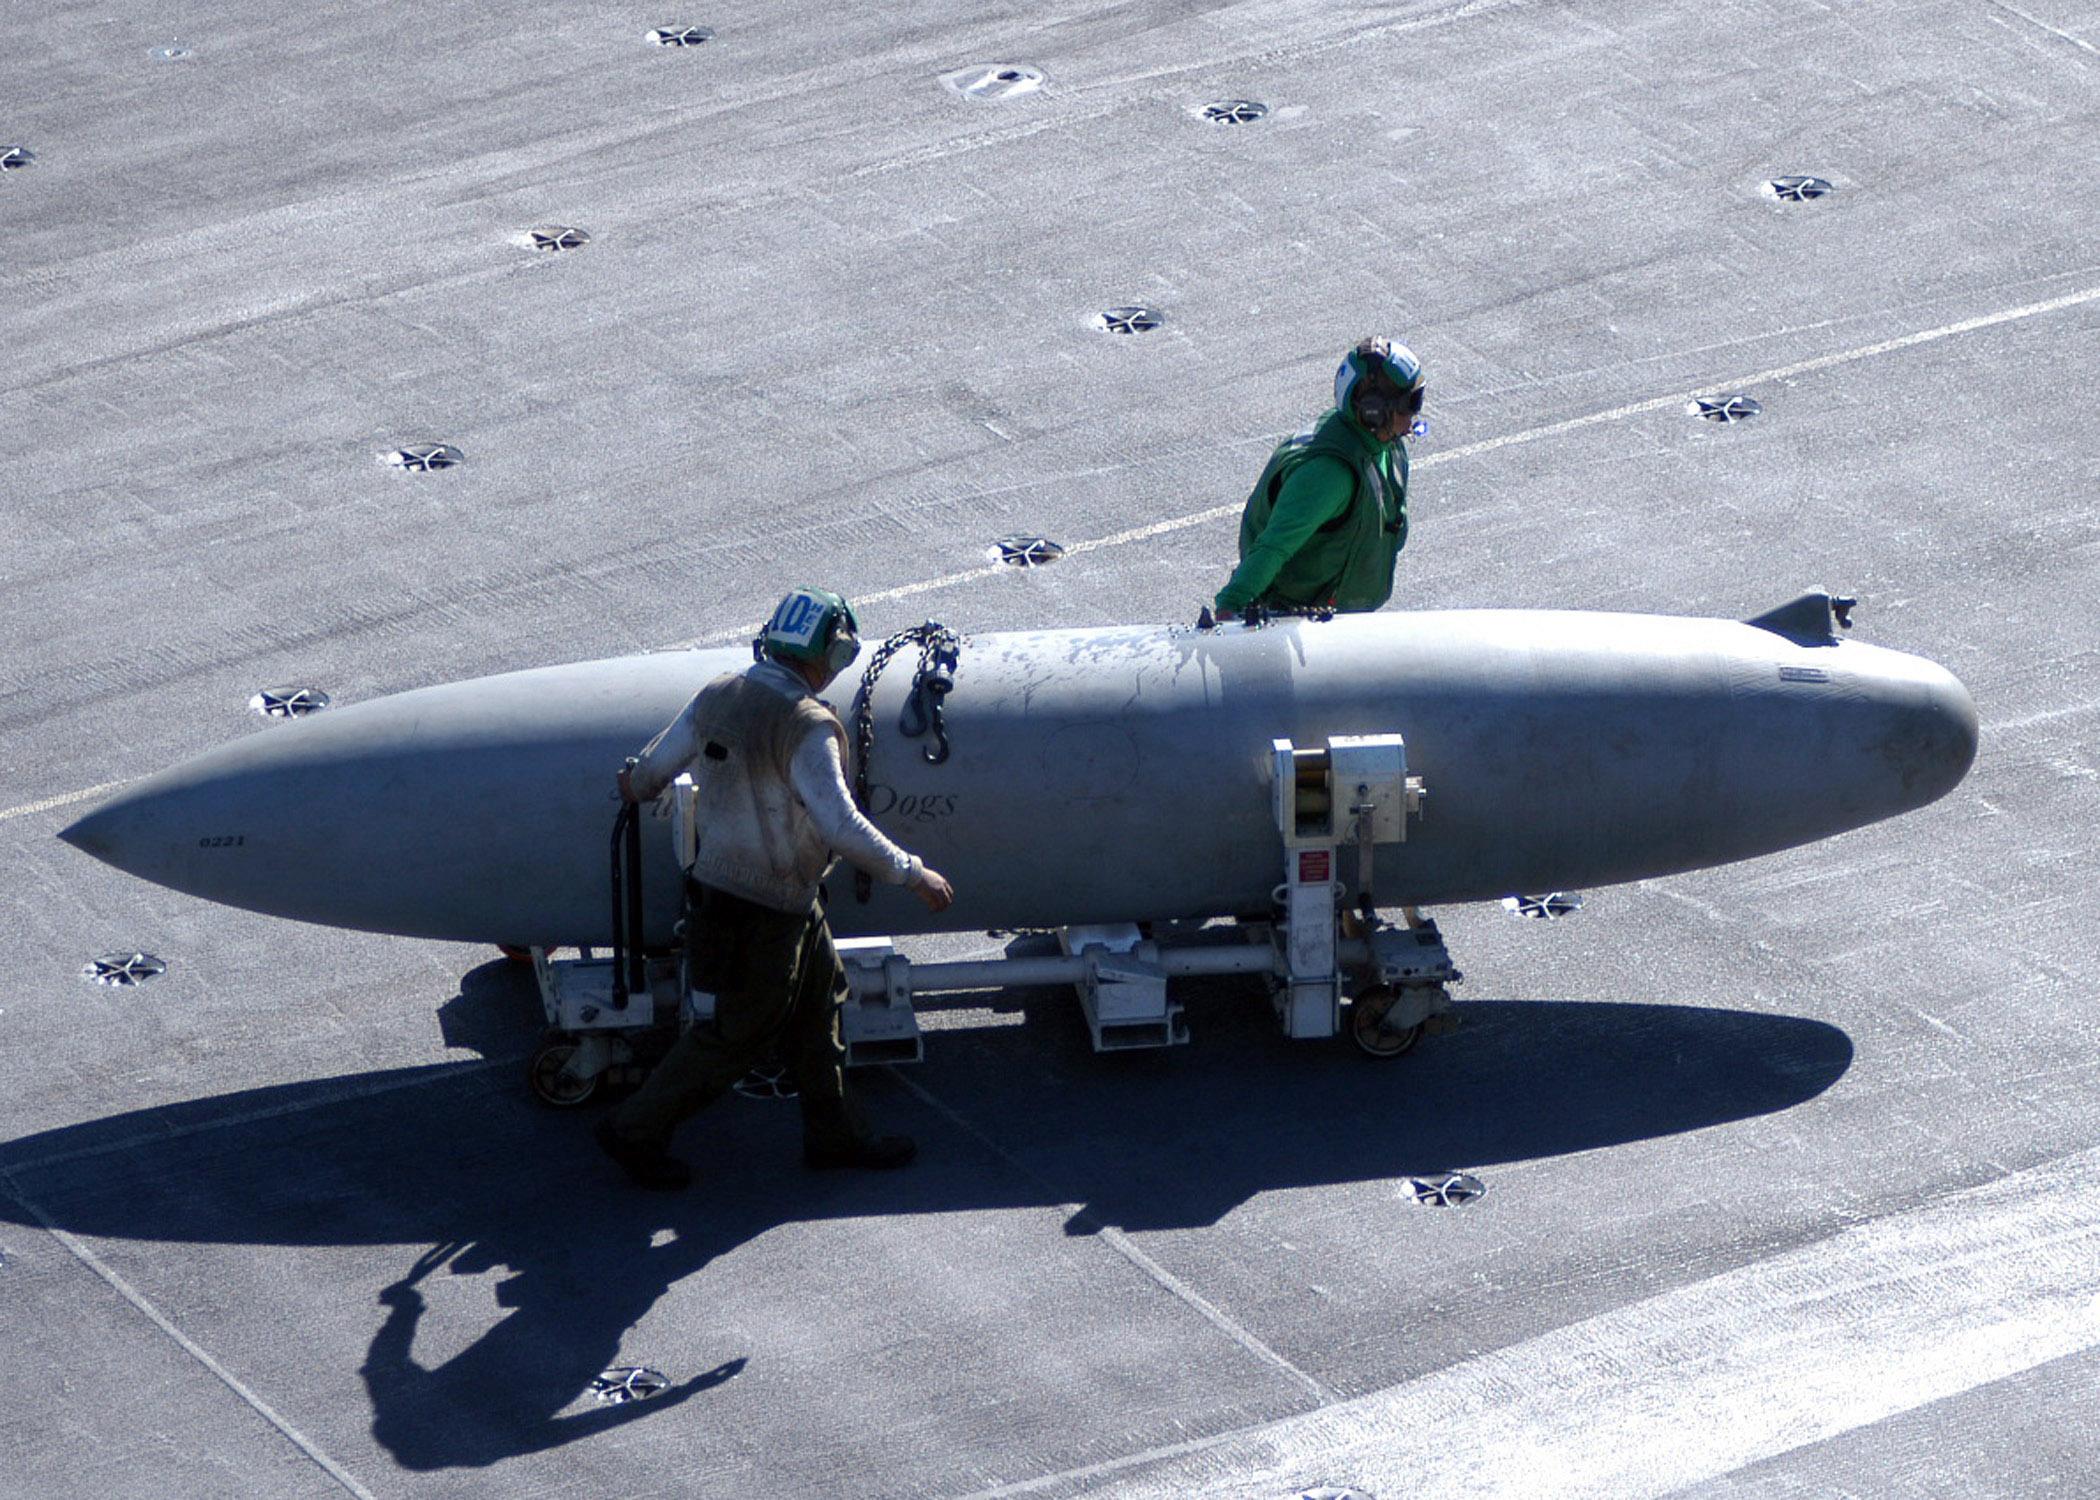 Tanque de combustible externo - Wikipedia, la enciclopedia libre